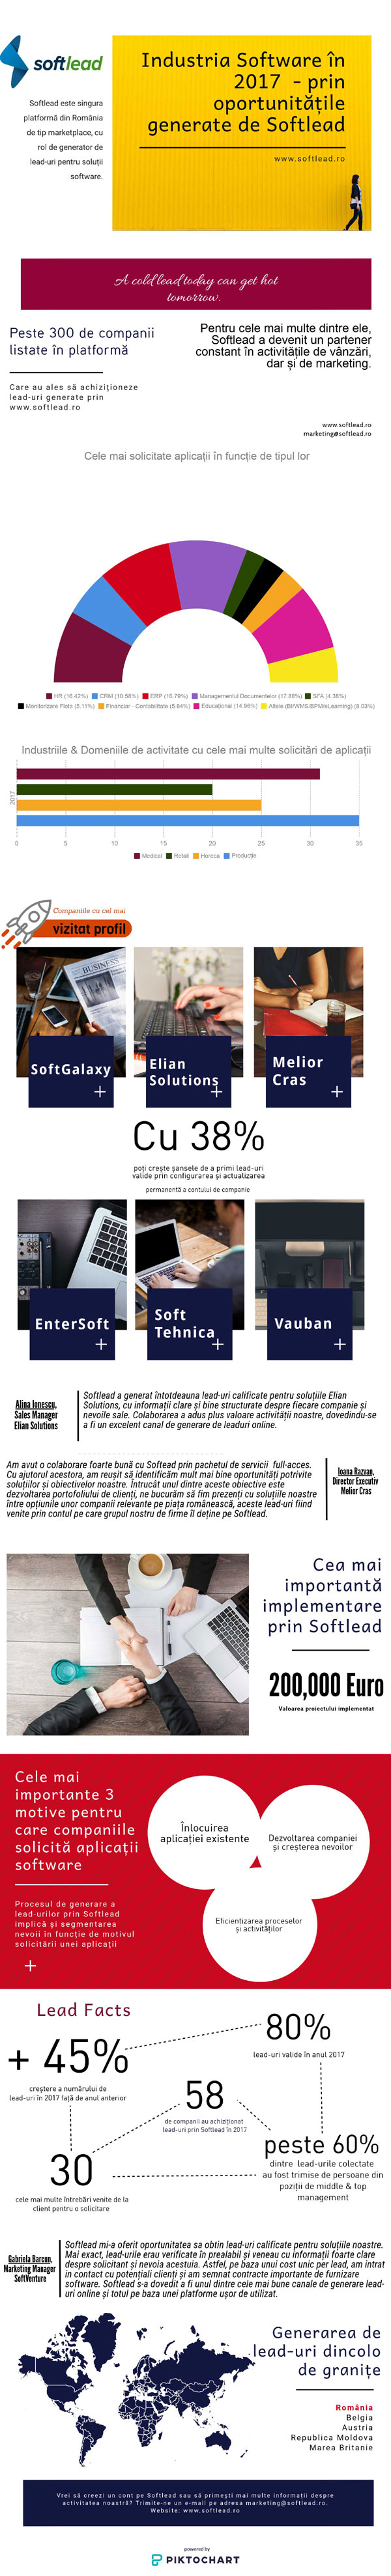 Infografic Softlead 2017